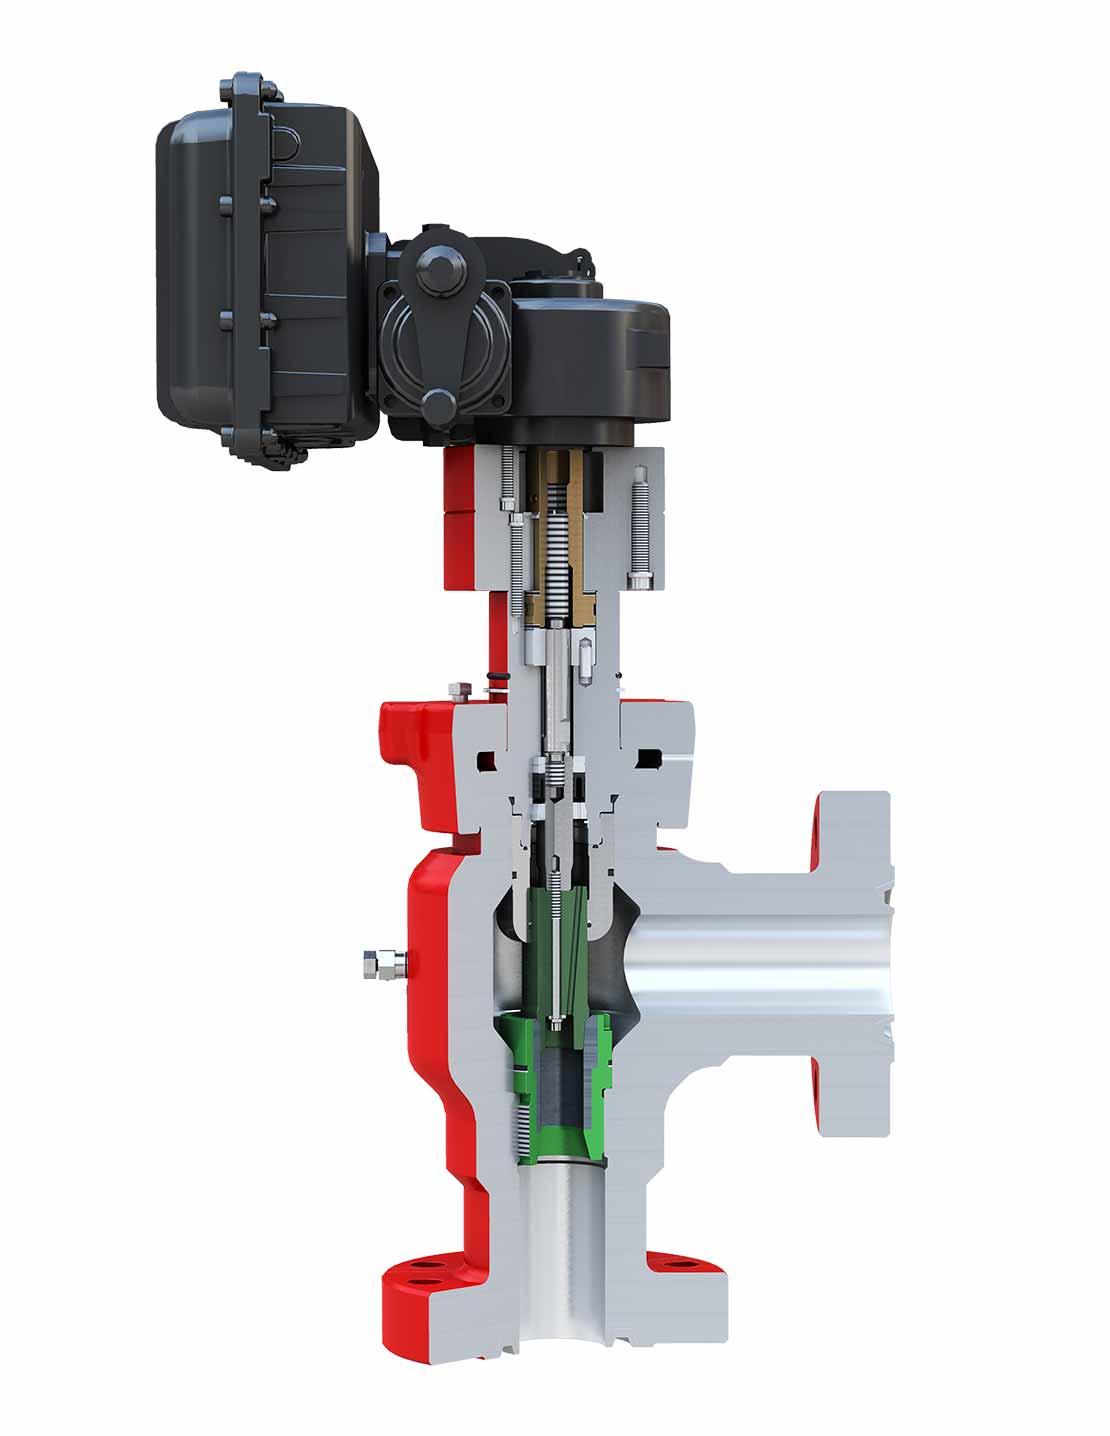 CAM30-DC Multitrim Drilling Choke 3D Cutaway